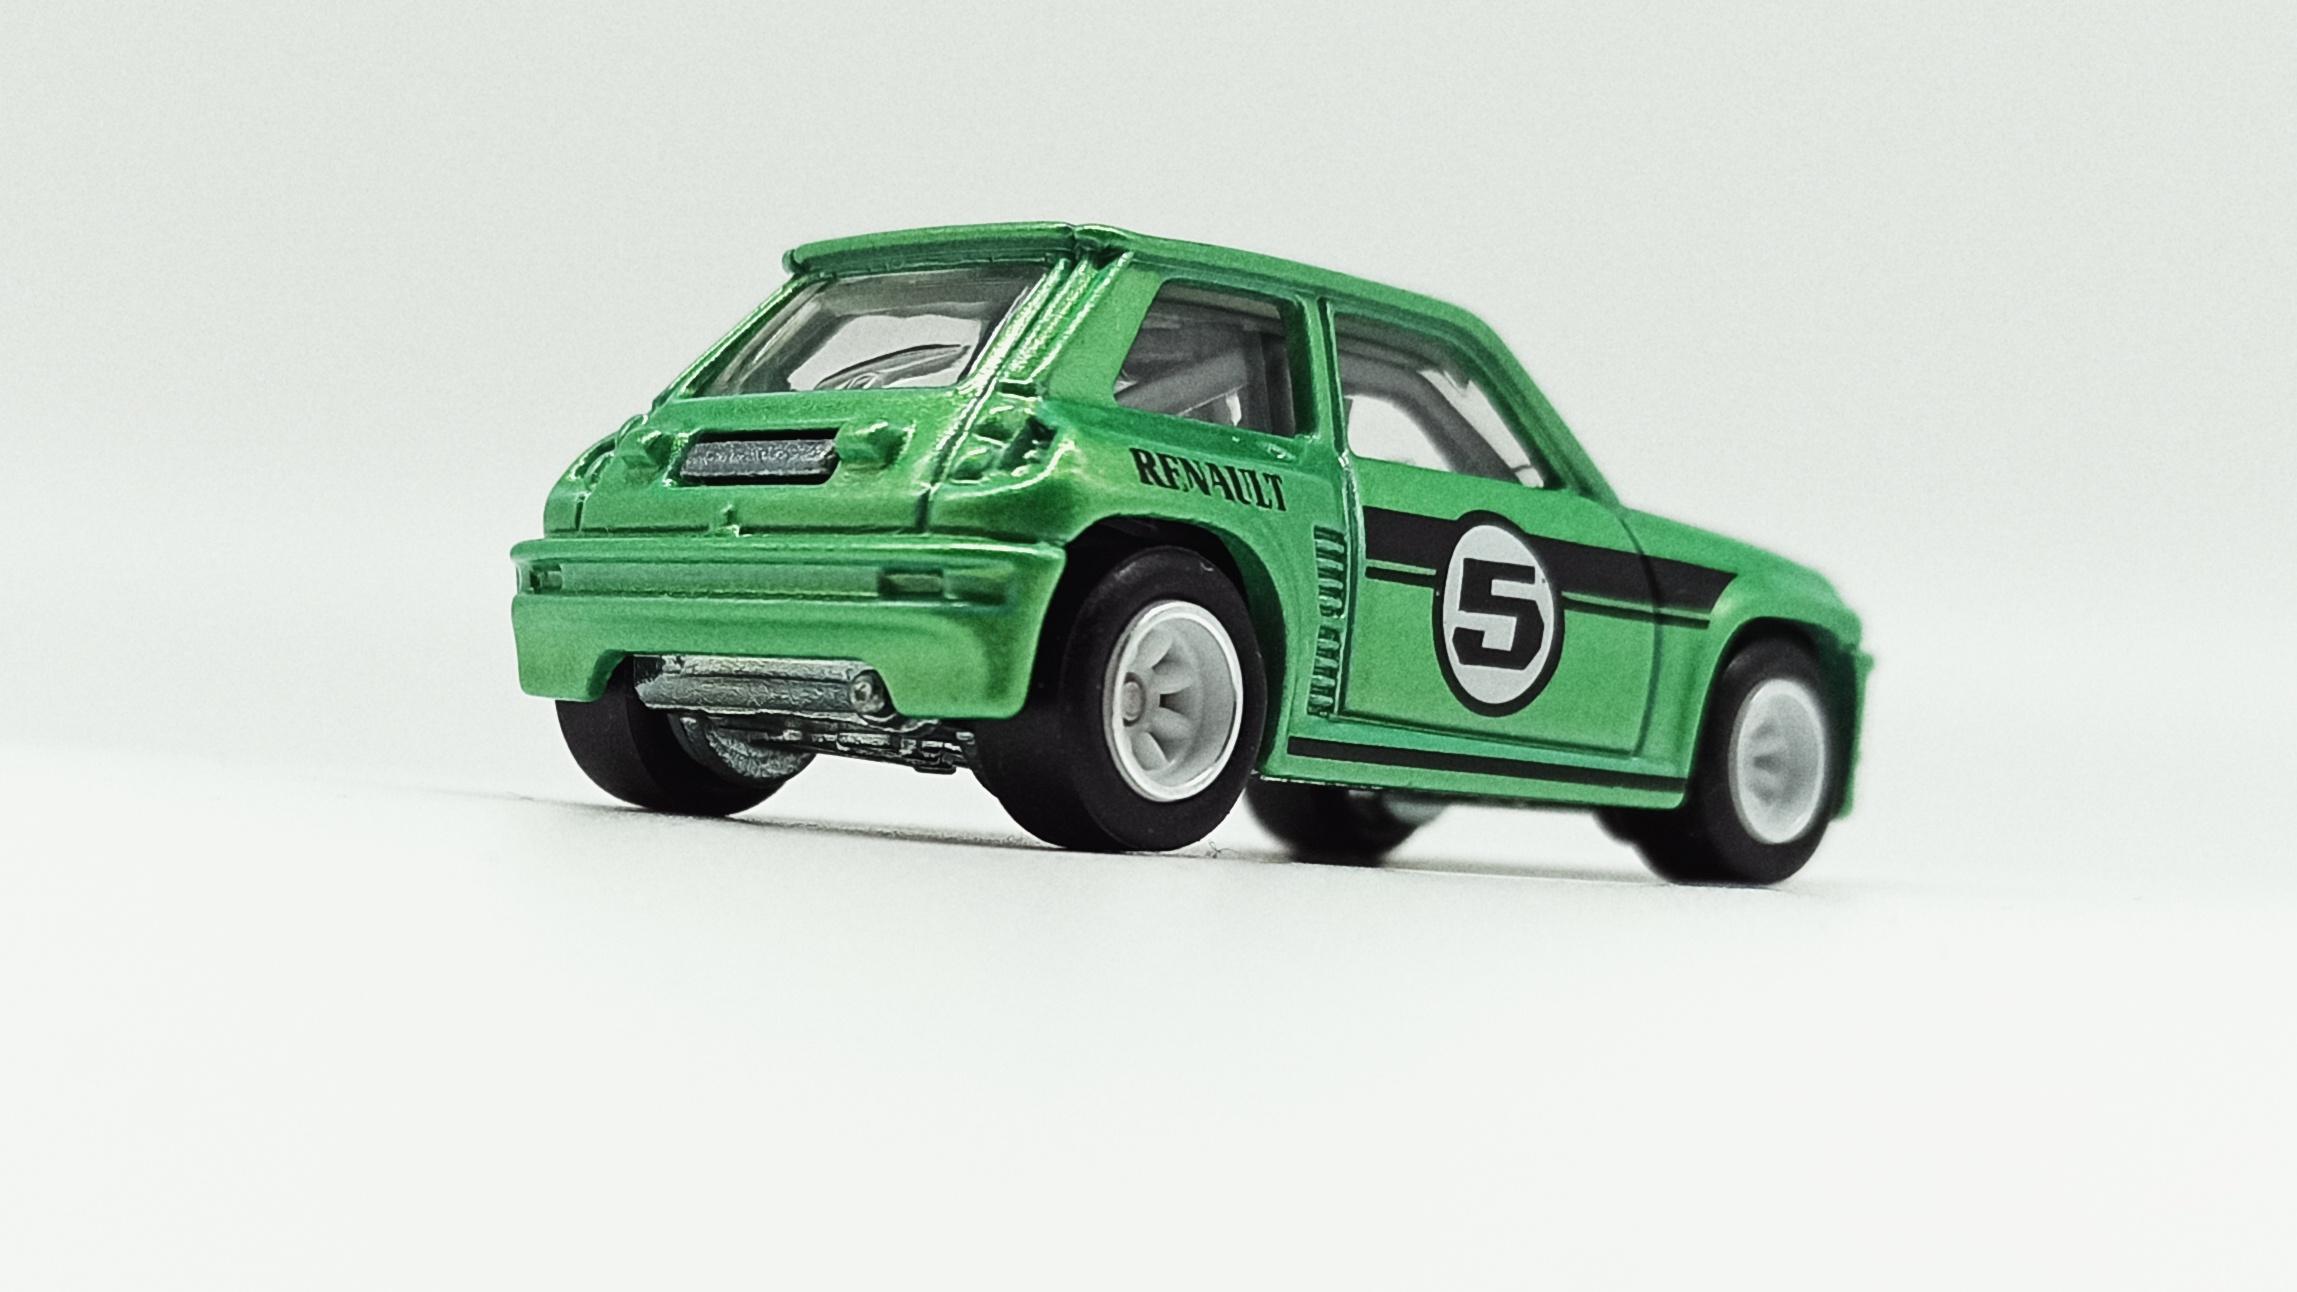 Hot Wheels Renault 5 Turbo (X8244) 2013 Boulevard metalflake green back angle